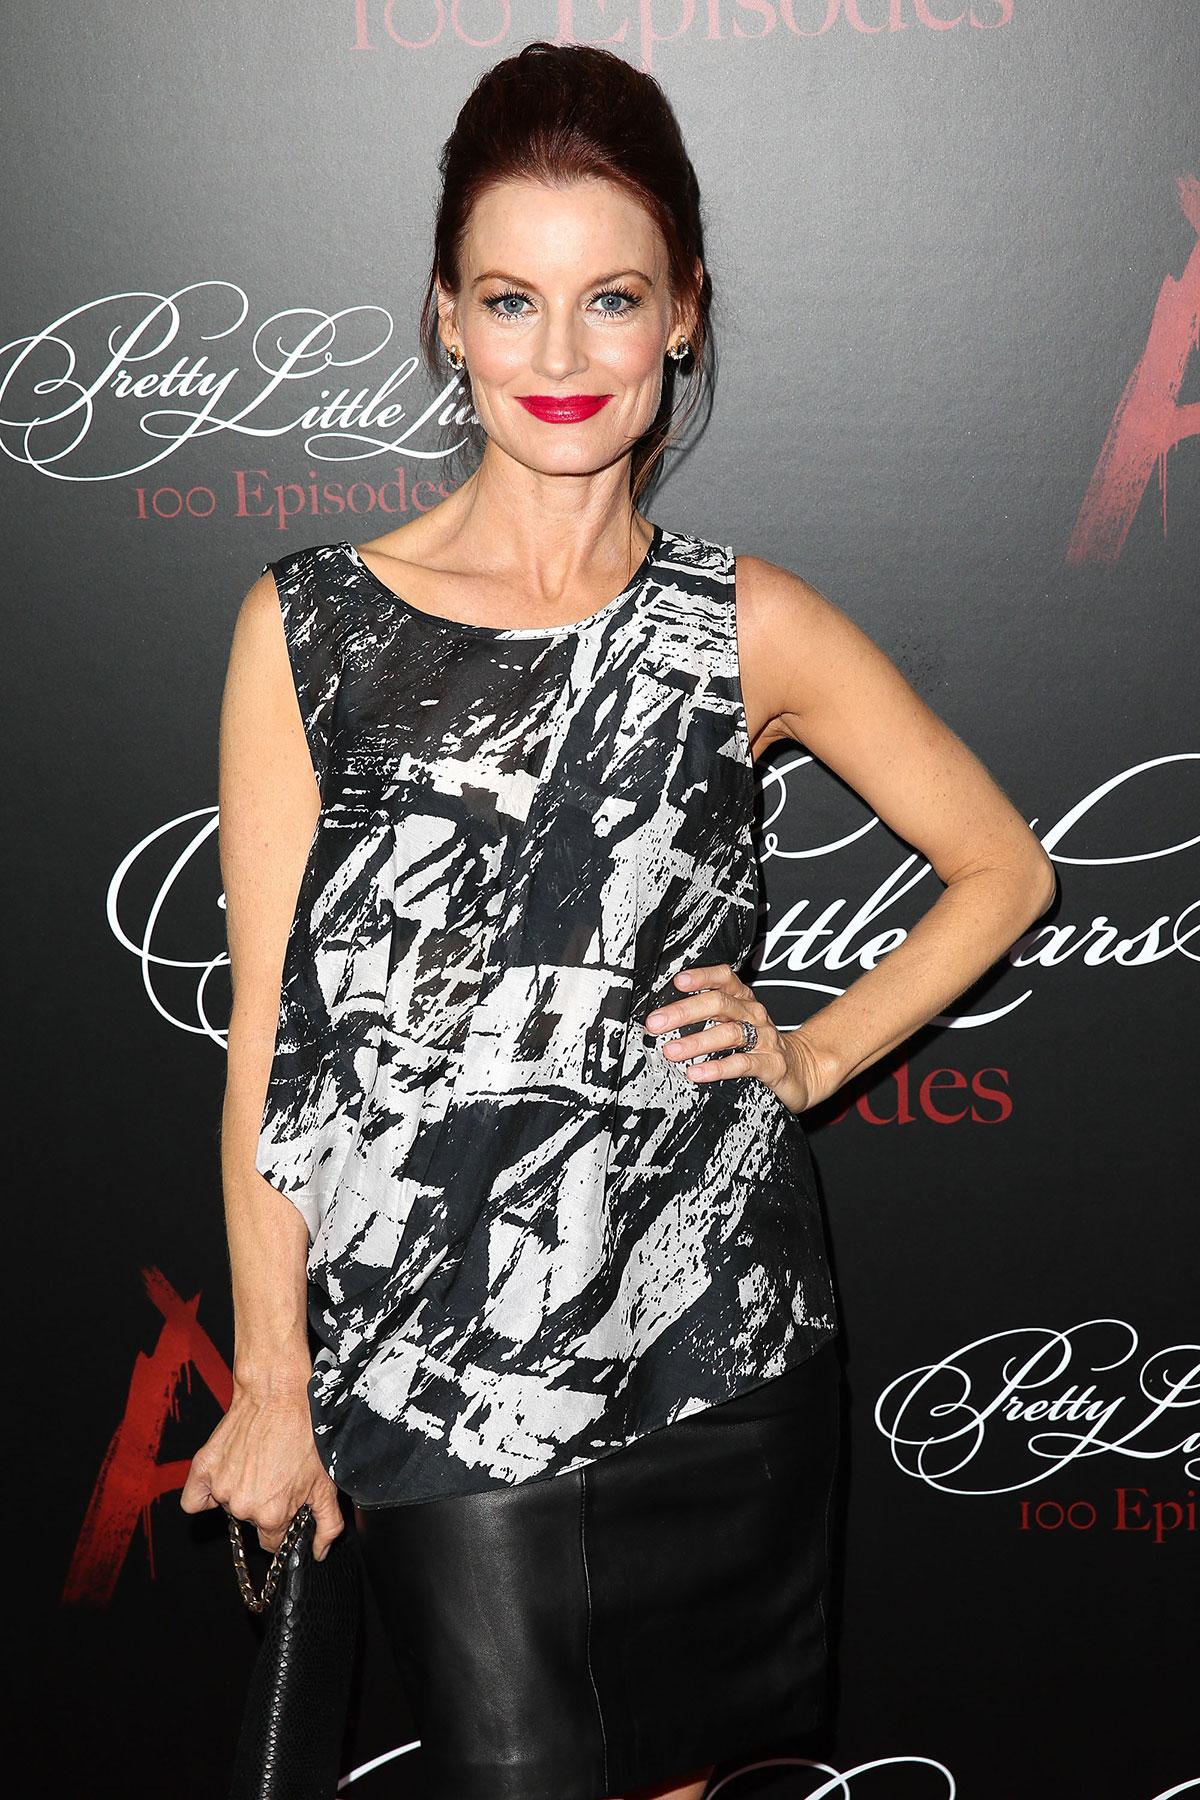 Laura Leighton attends Pretty Little Liars 100th episode celebration